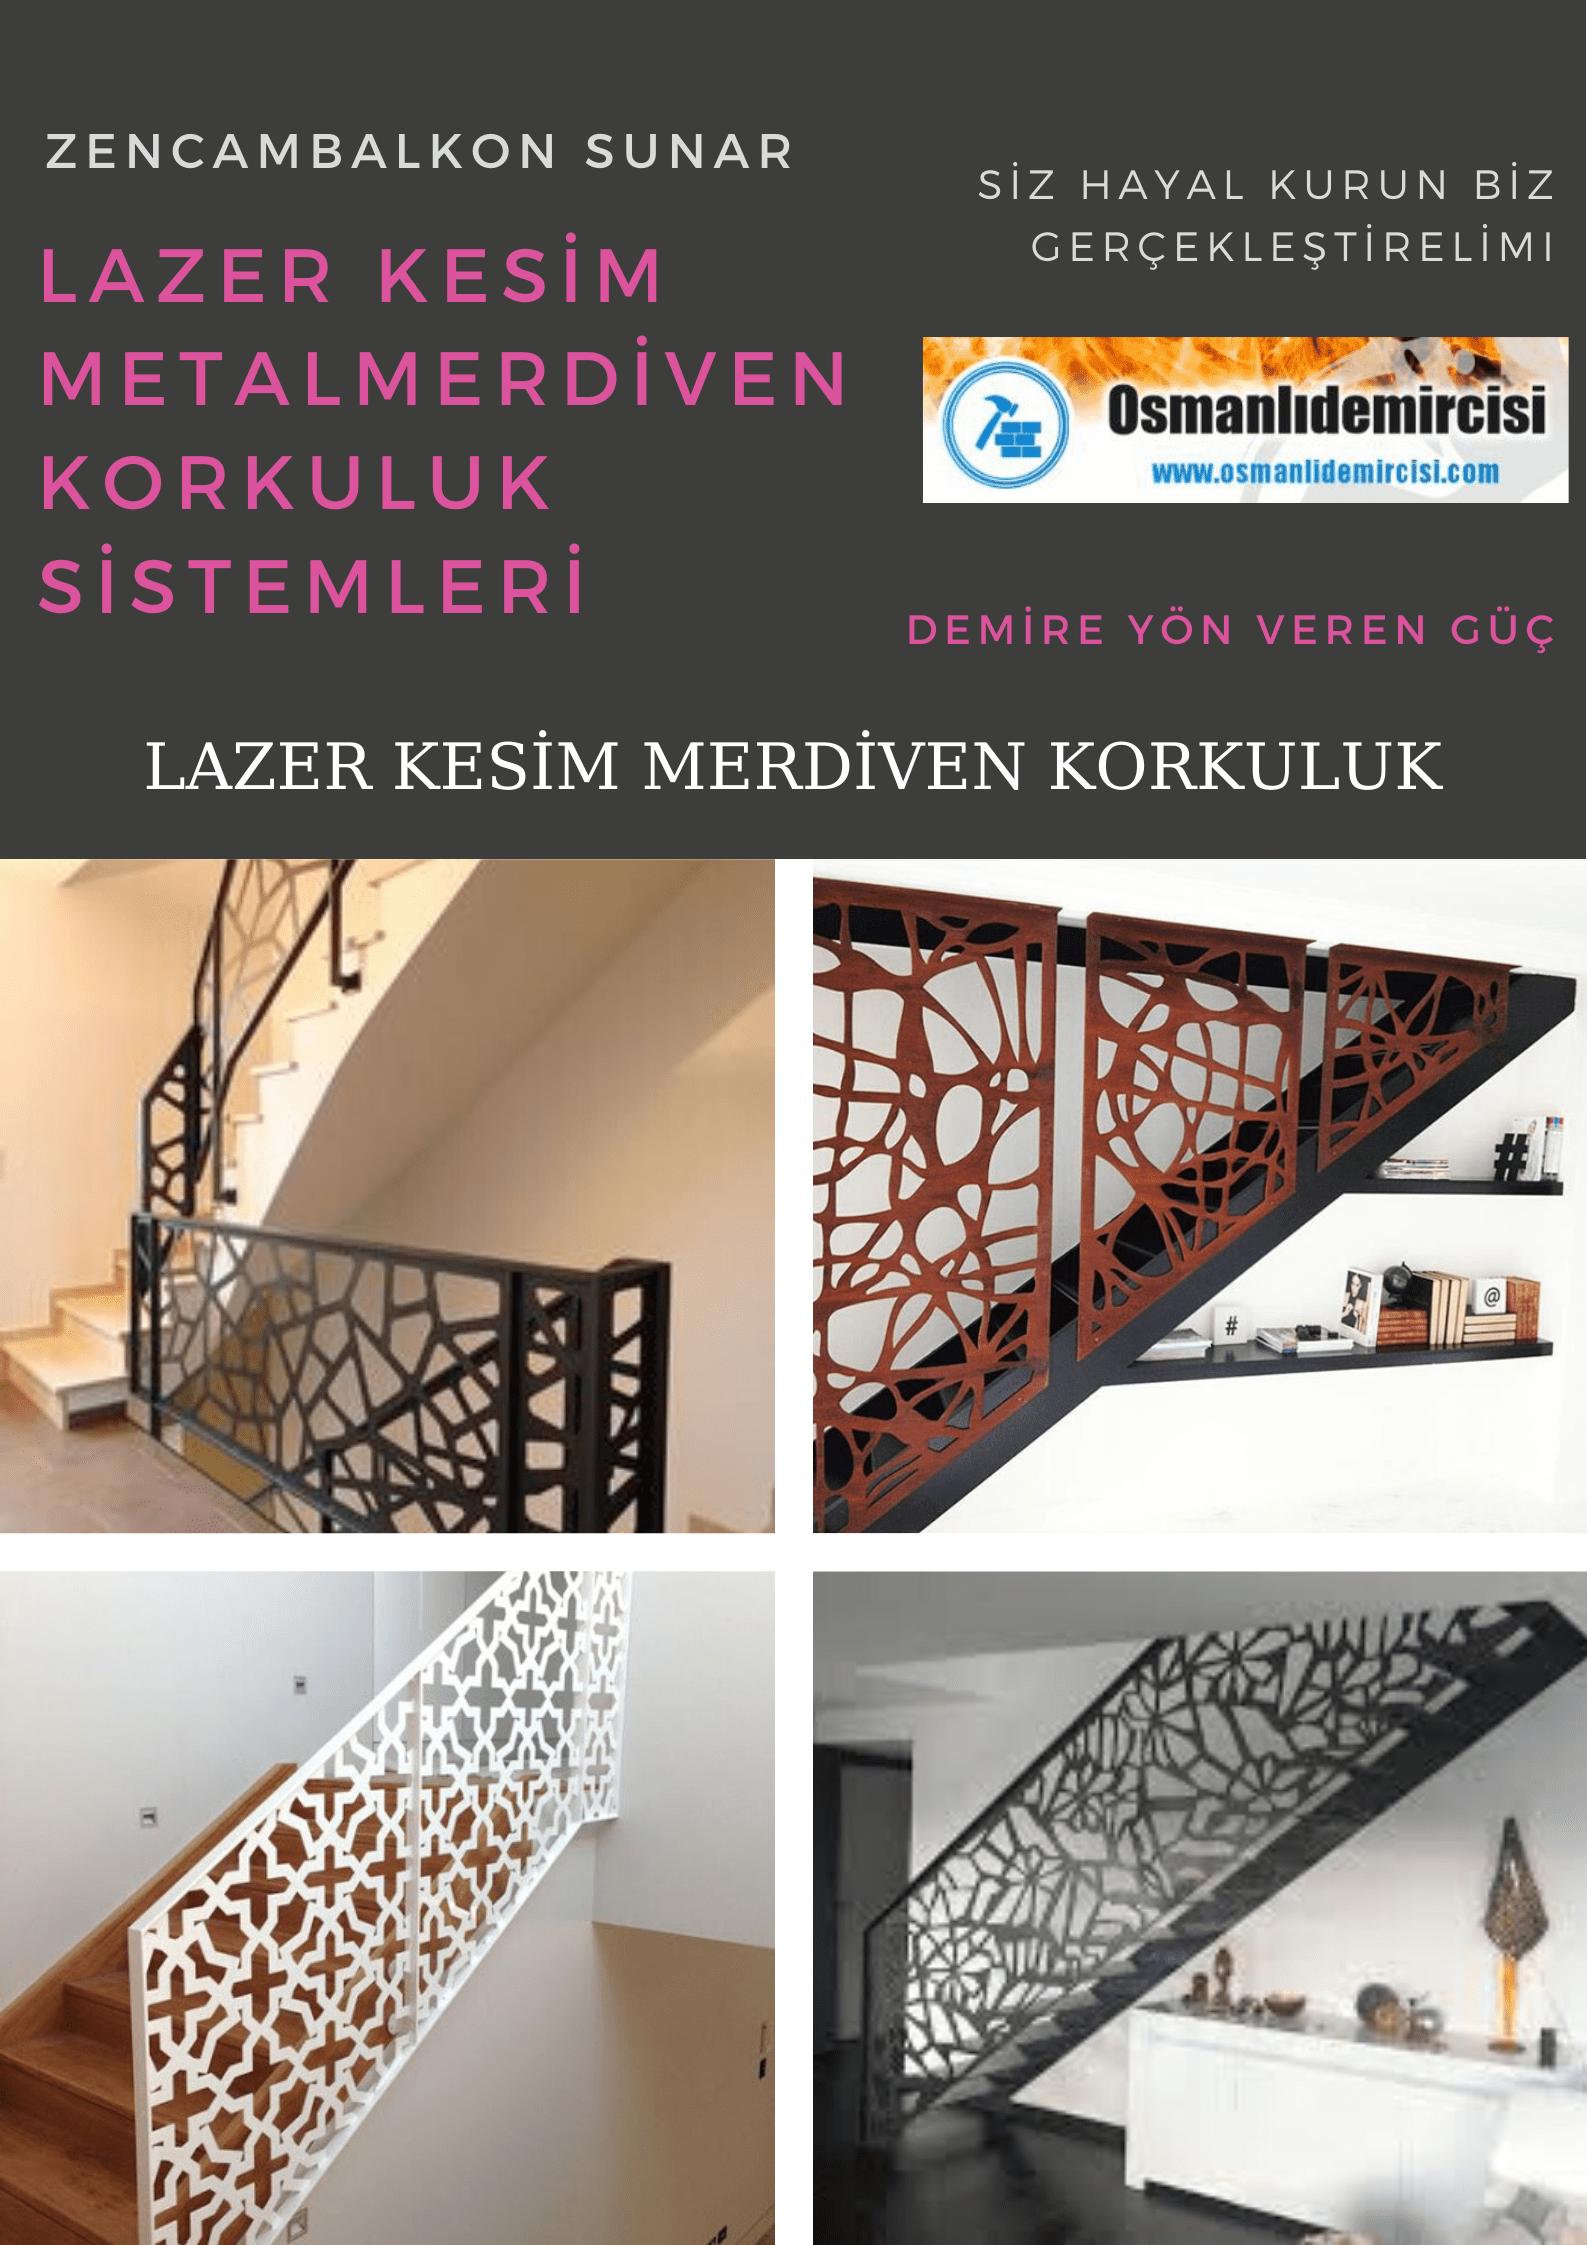 Lazer kesim merdiven metal korkuluk İzmir